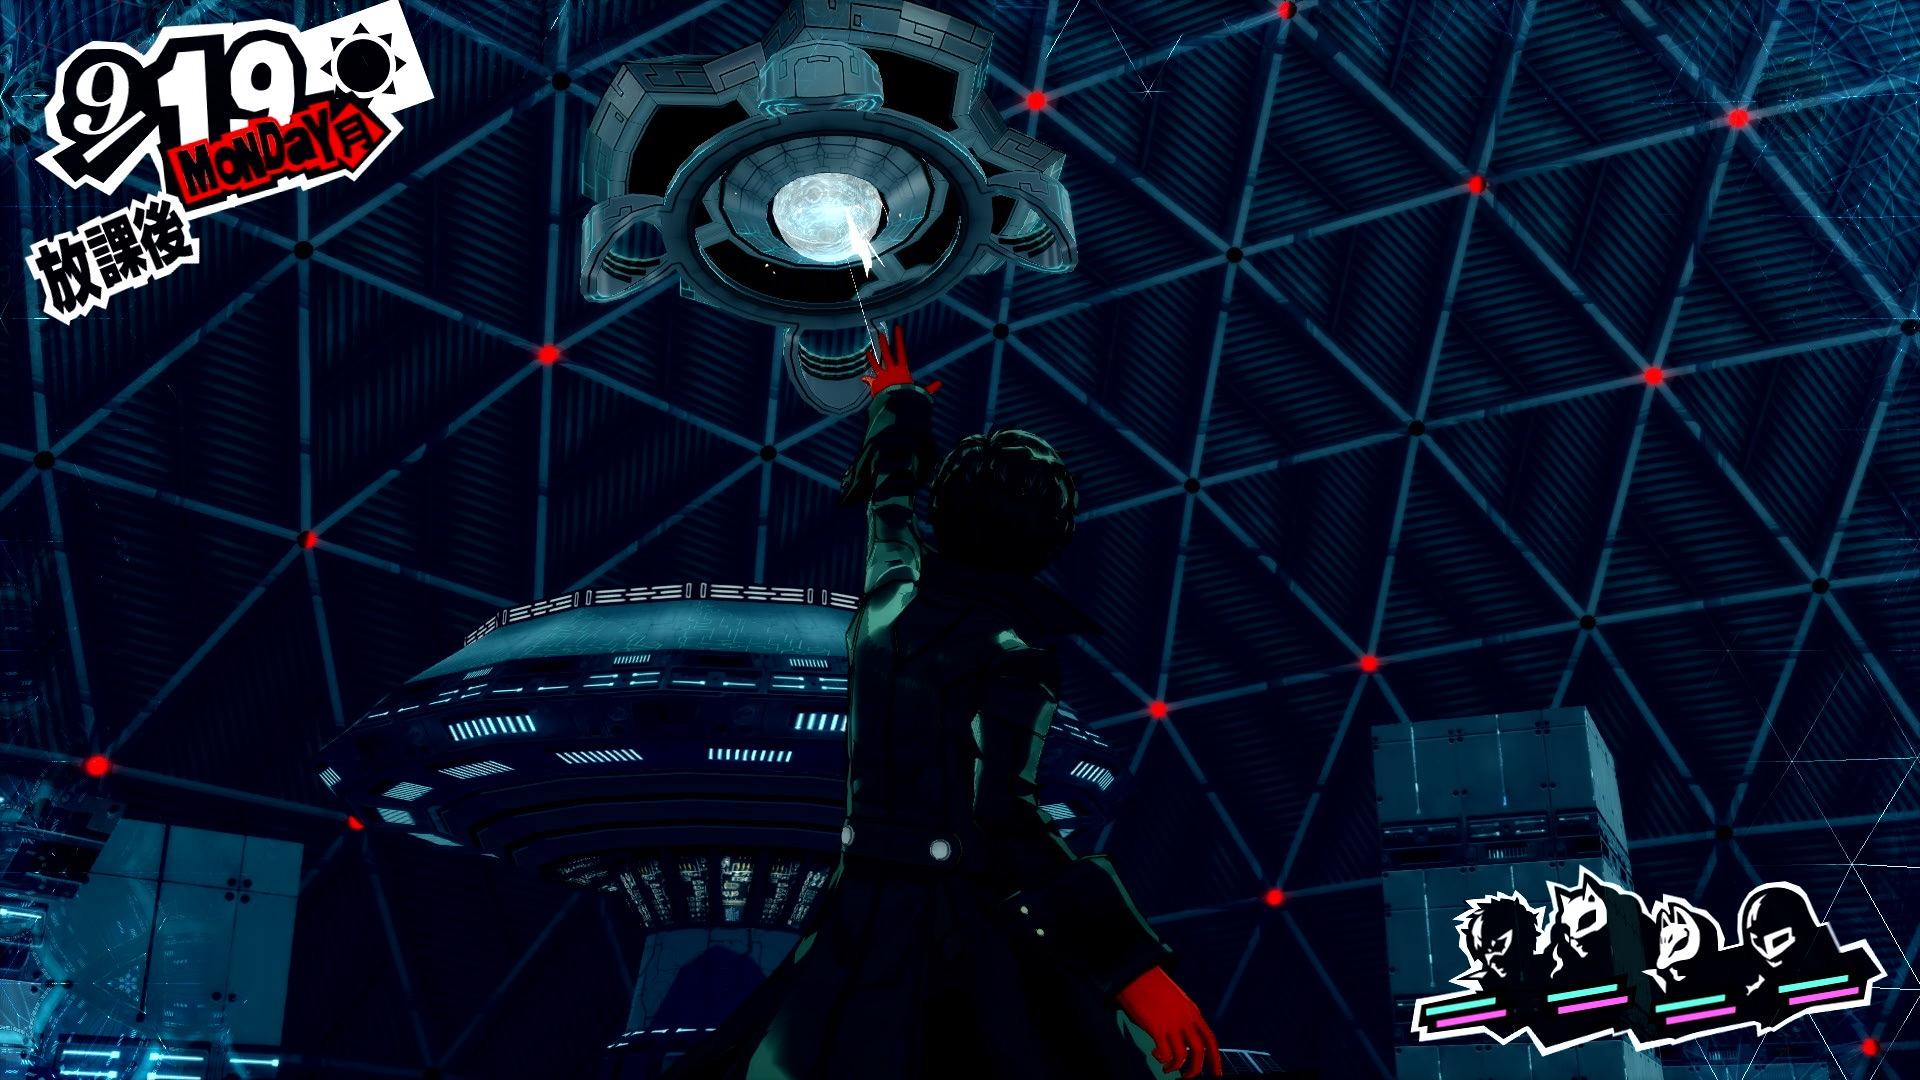 《P5R》中原版DLC可花6毛再次购入 海量高清截图放出